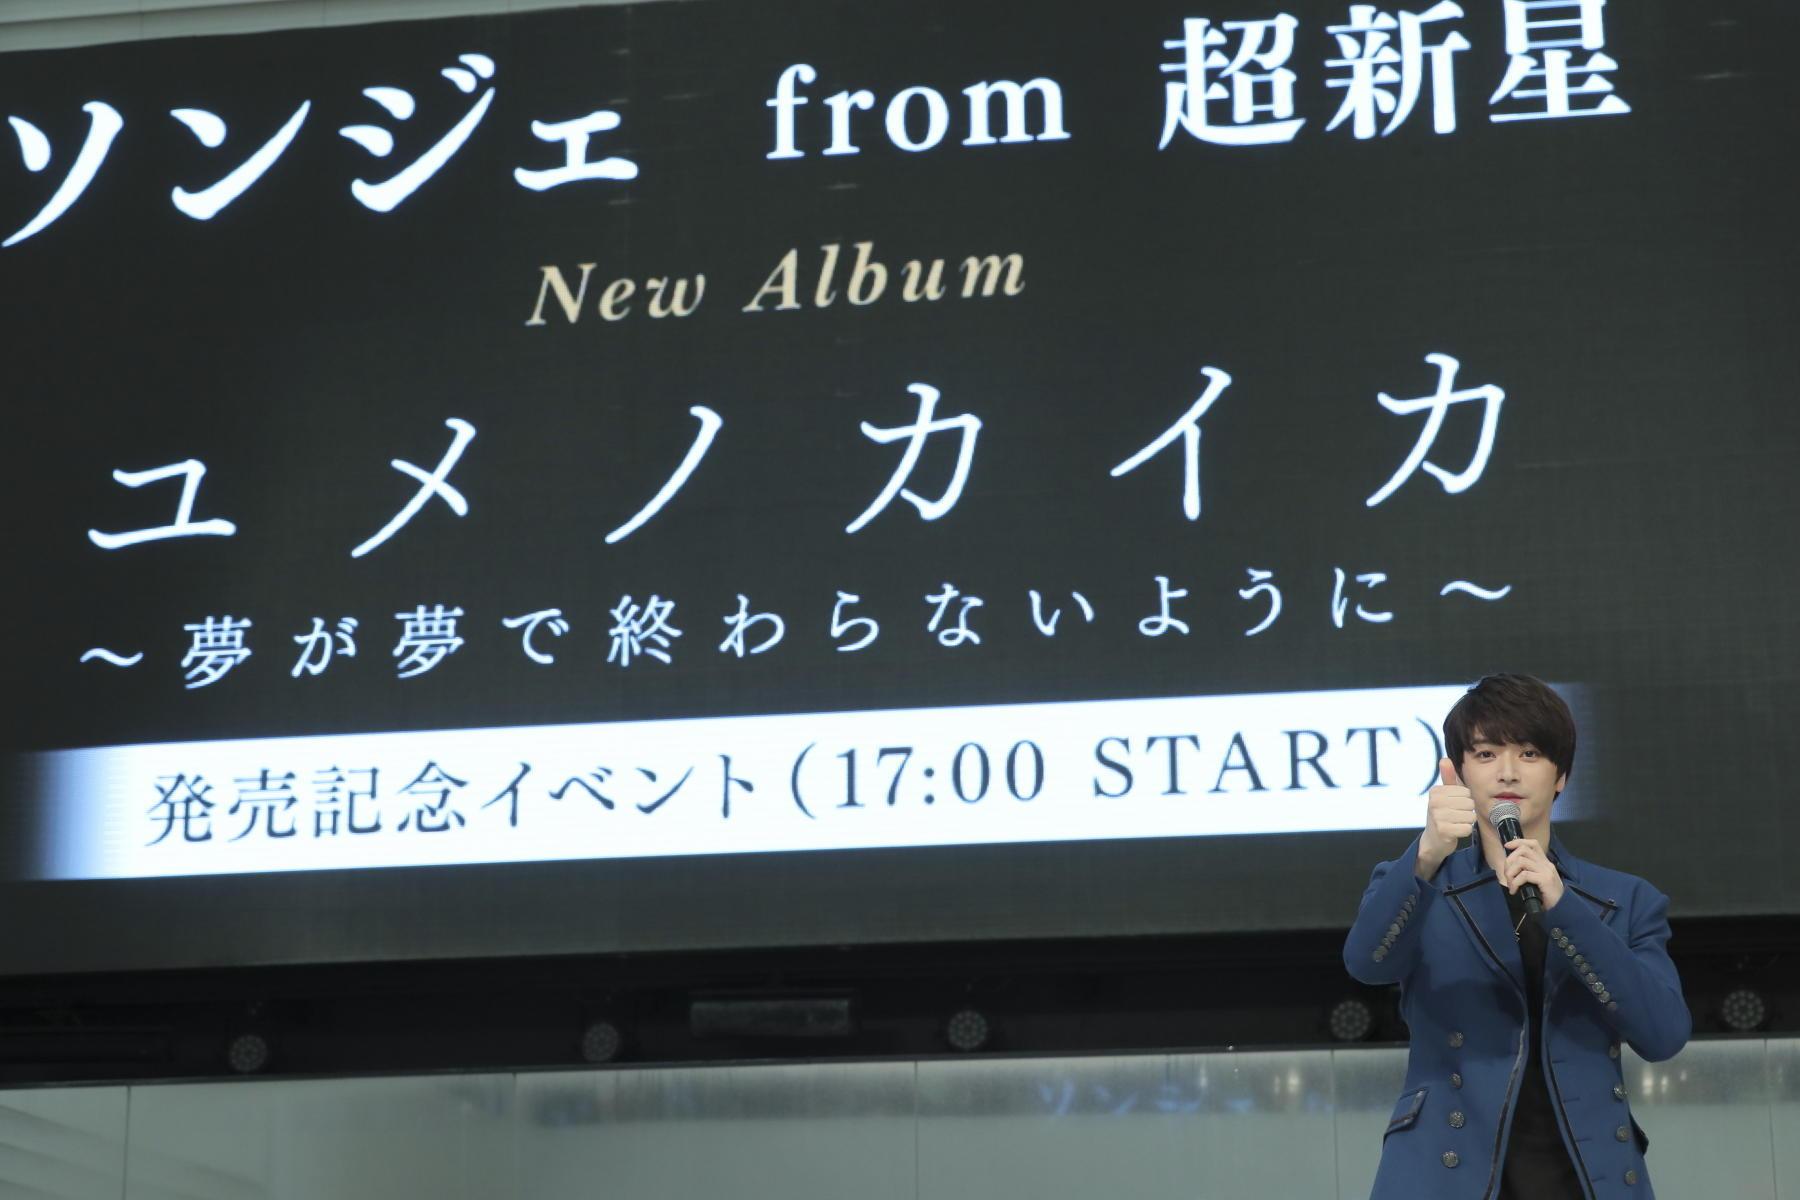 http://news.yoshimoto.co.jp/20180309090549-62bb01ff8231d8c111ef3dd55062778641f65fe9.jpg